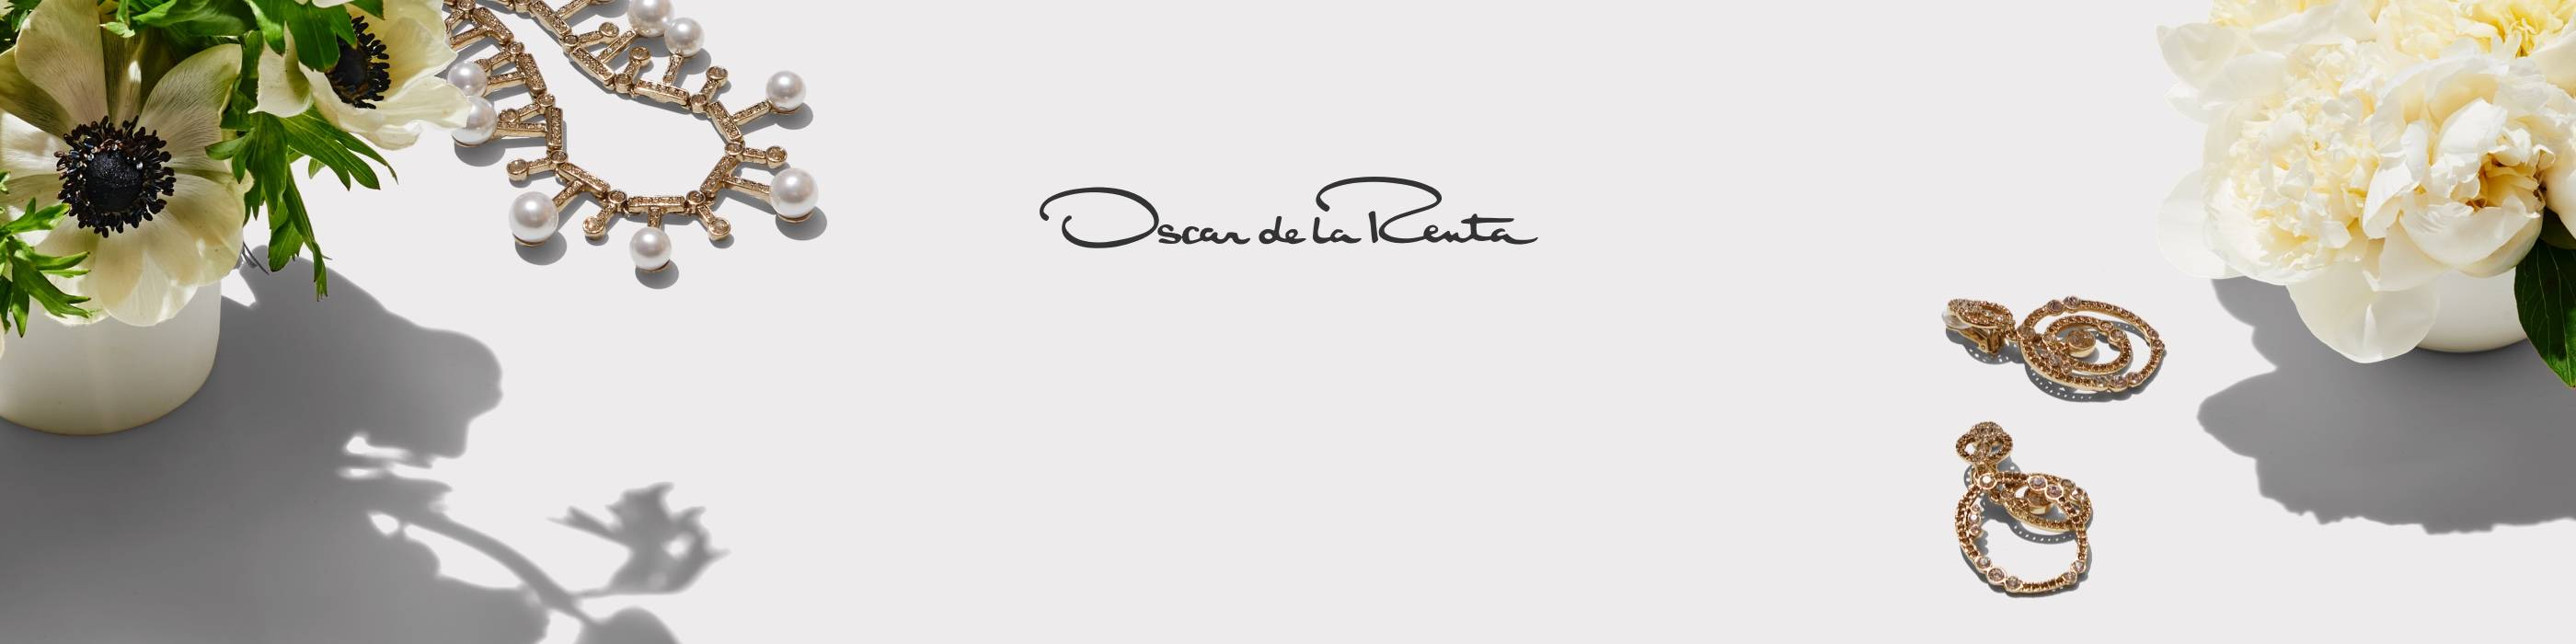 Oscar de la Renta for Paperless Post